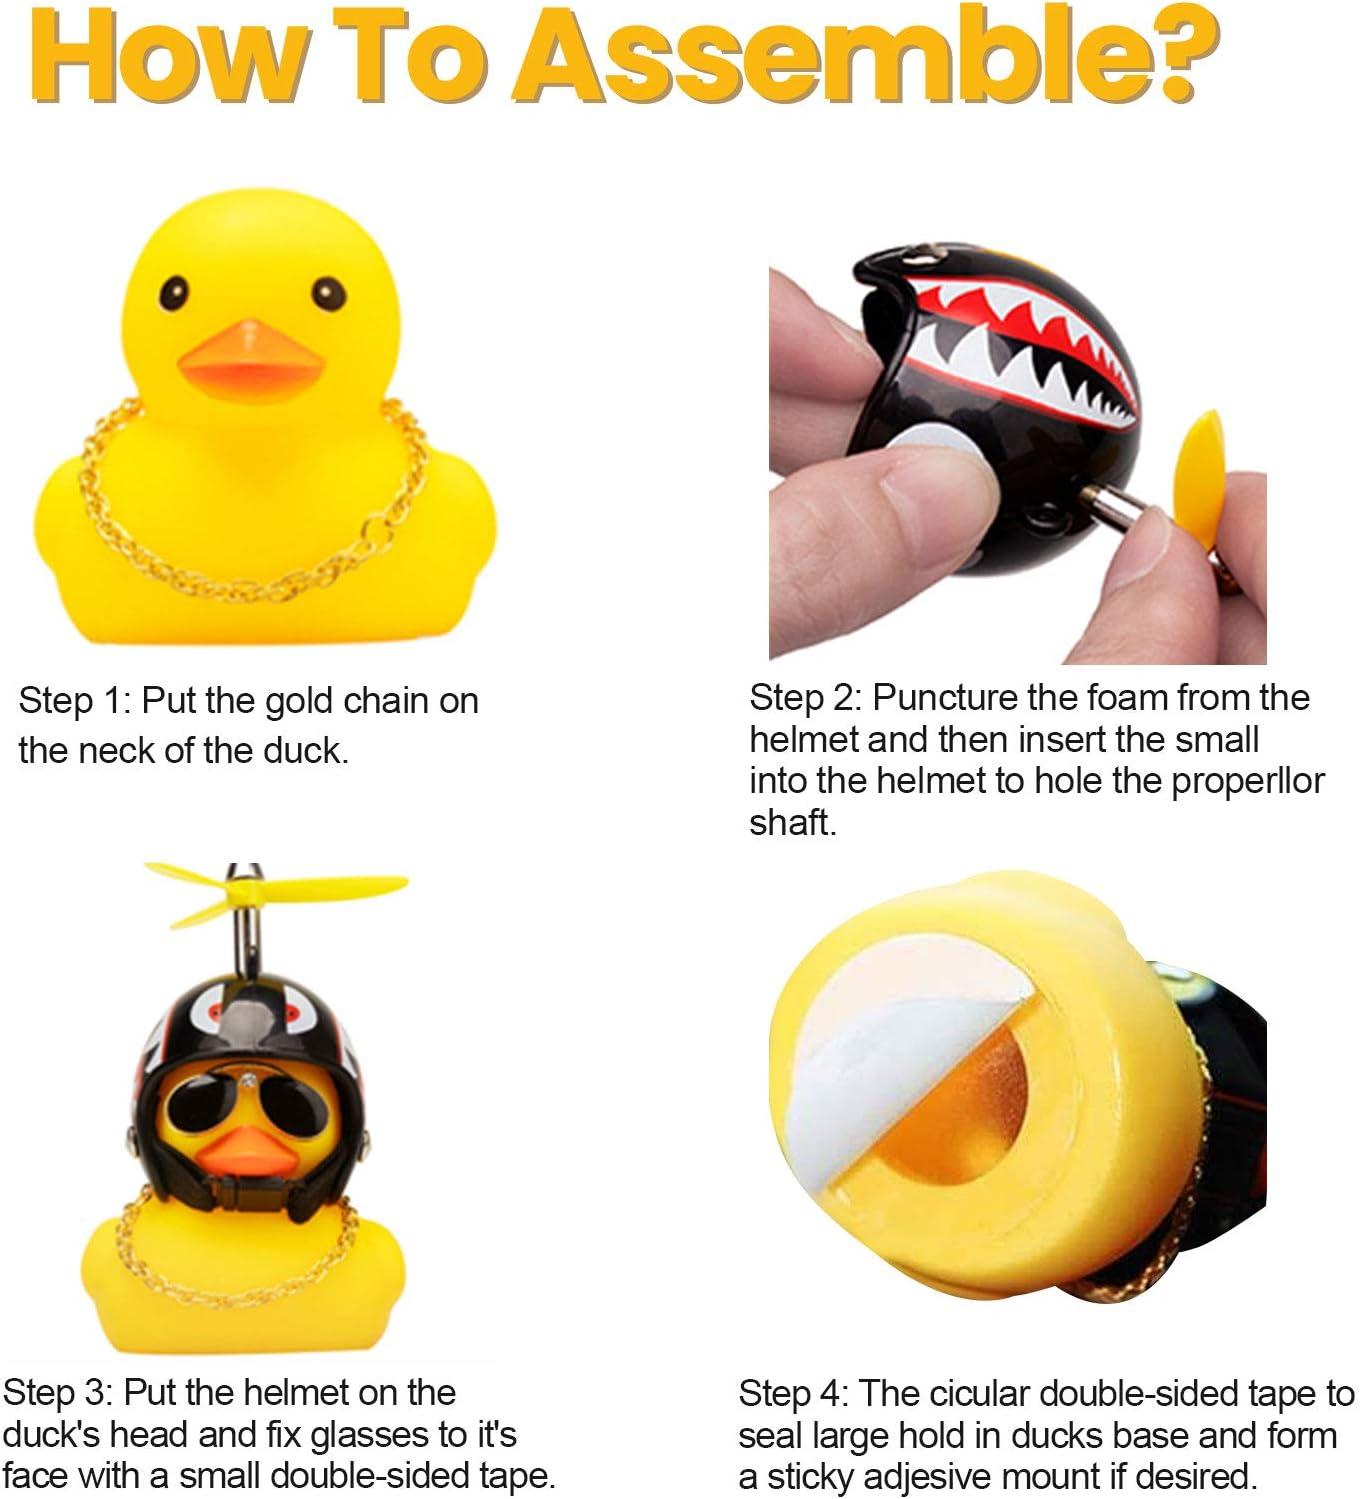 Shark + Black 8 Duck Car Dashboard Decorations Rubber Duck Car Ornaments Cool Duck with Propeller Helmet Sunglasses Gold Chain